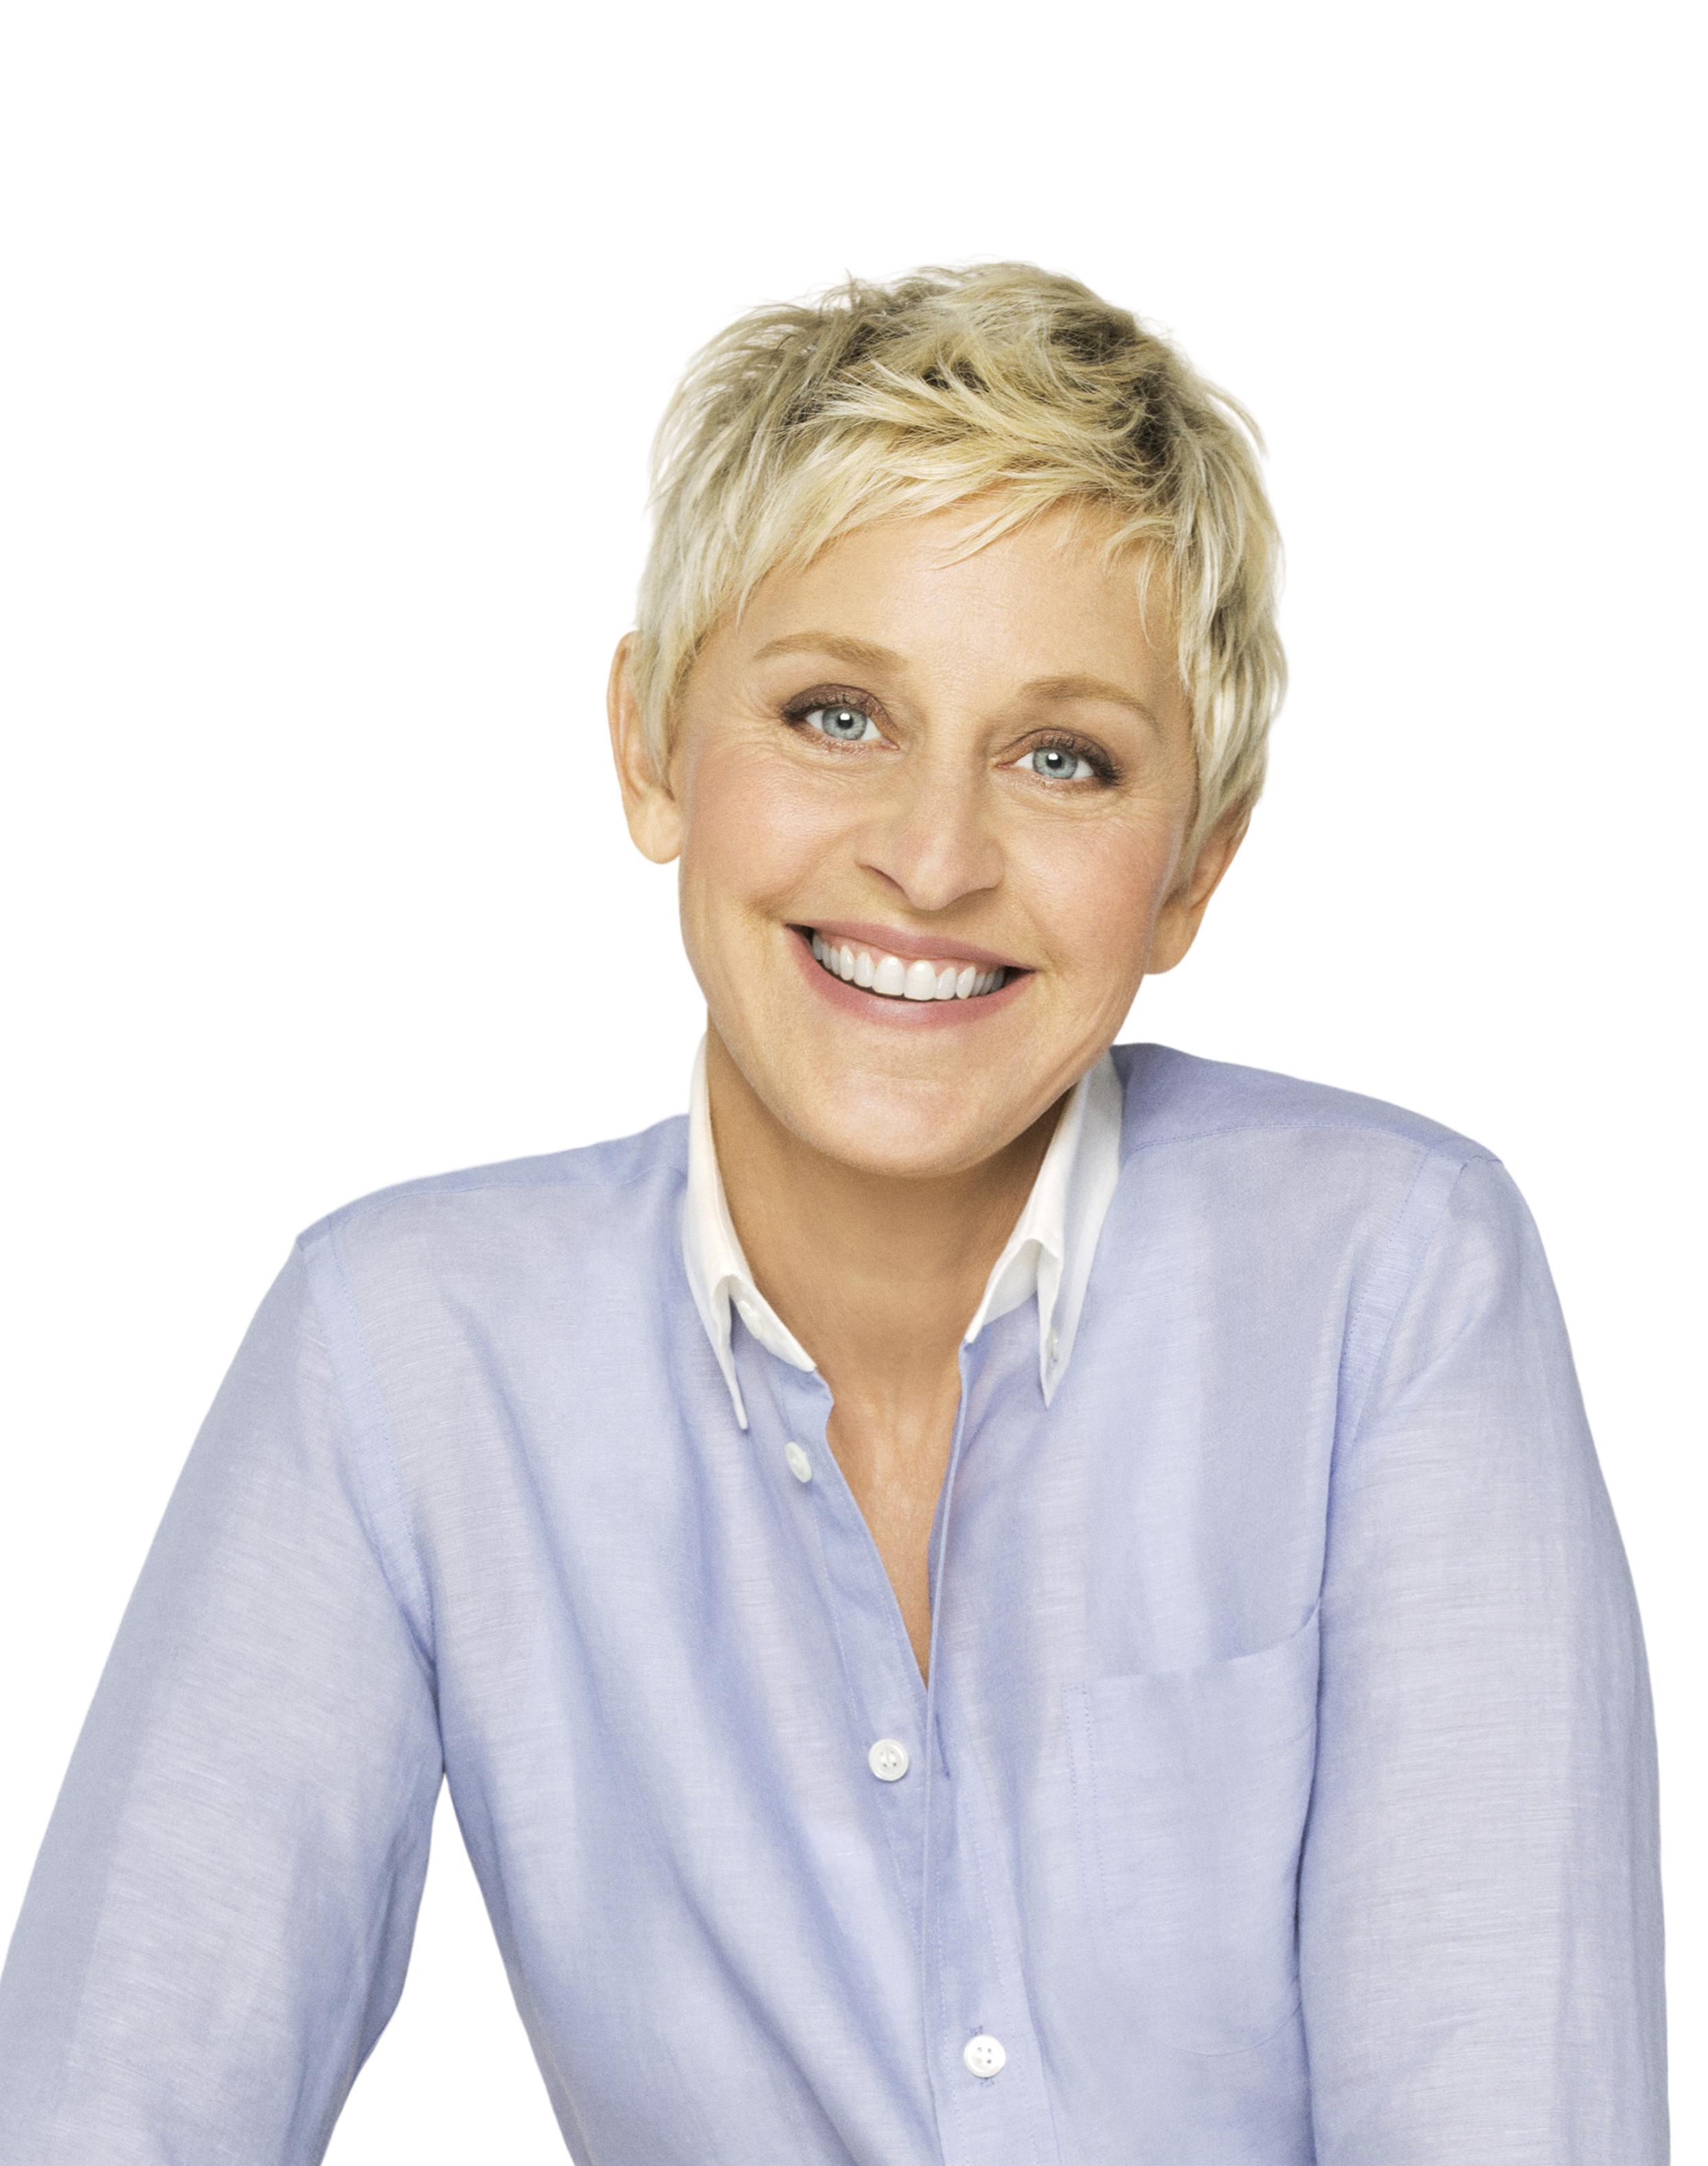 Ellen DeGeneres Oscars Headshot - P 2013